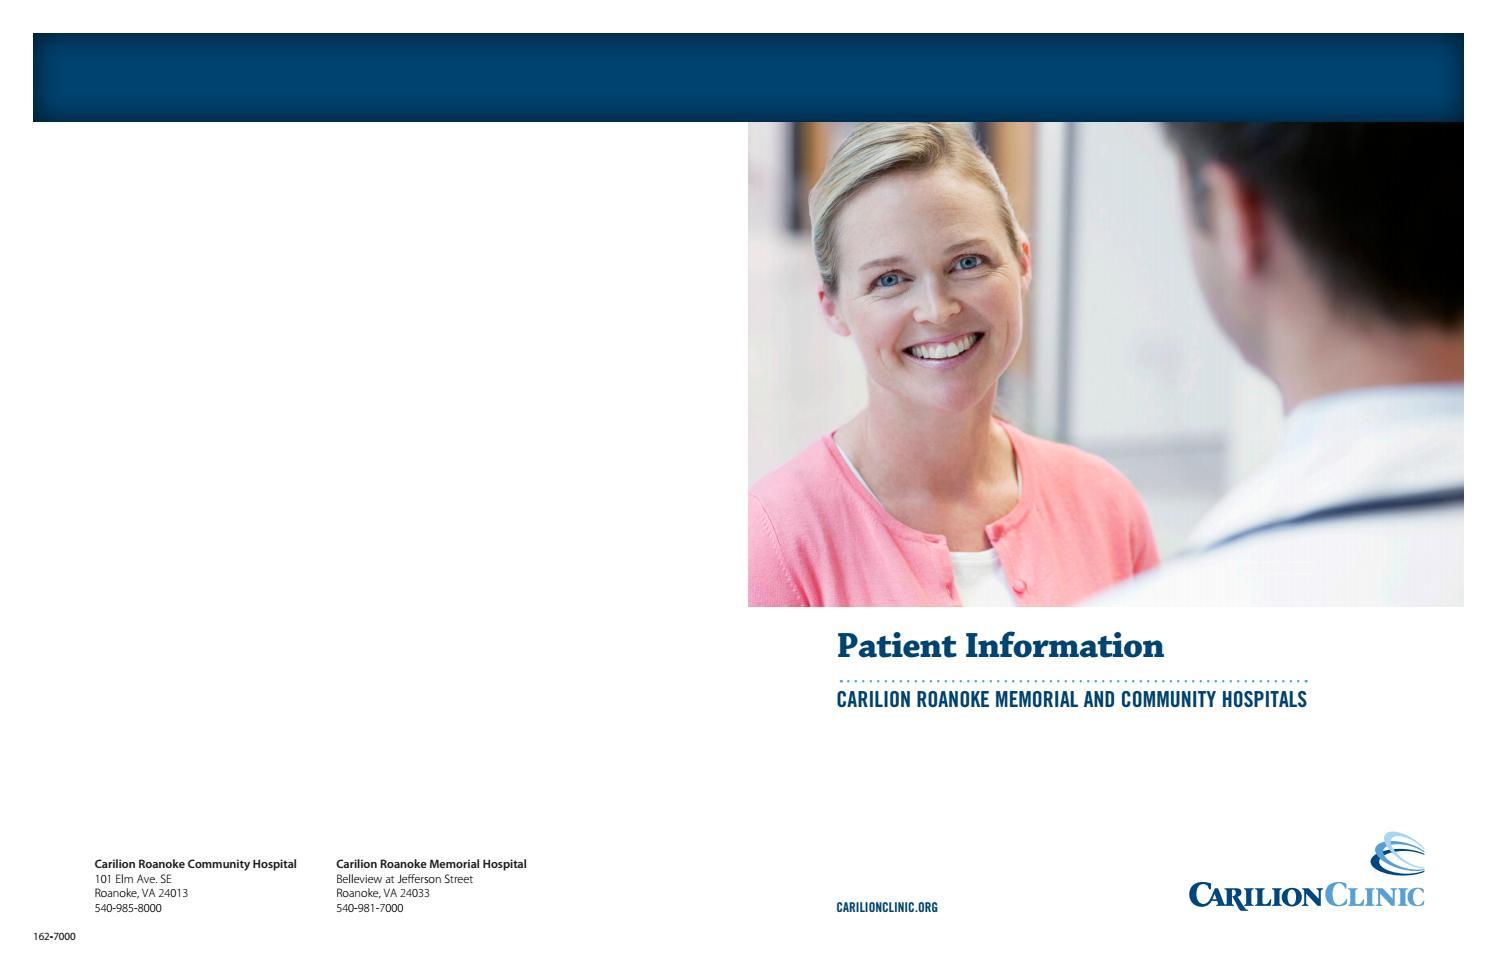 Patient Guide - Carilion Roanoke Memorial and Community